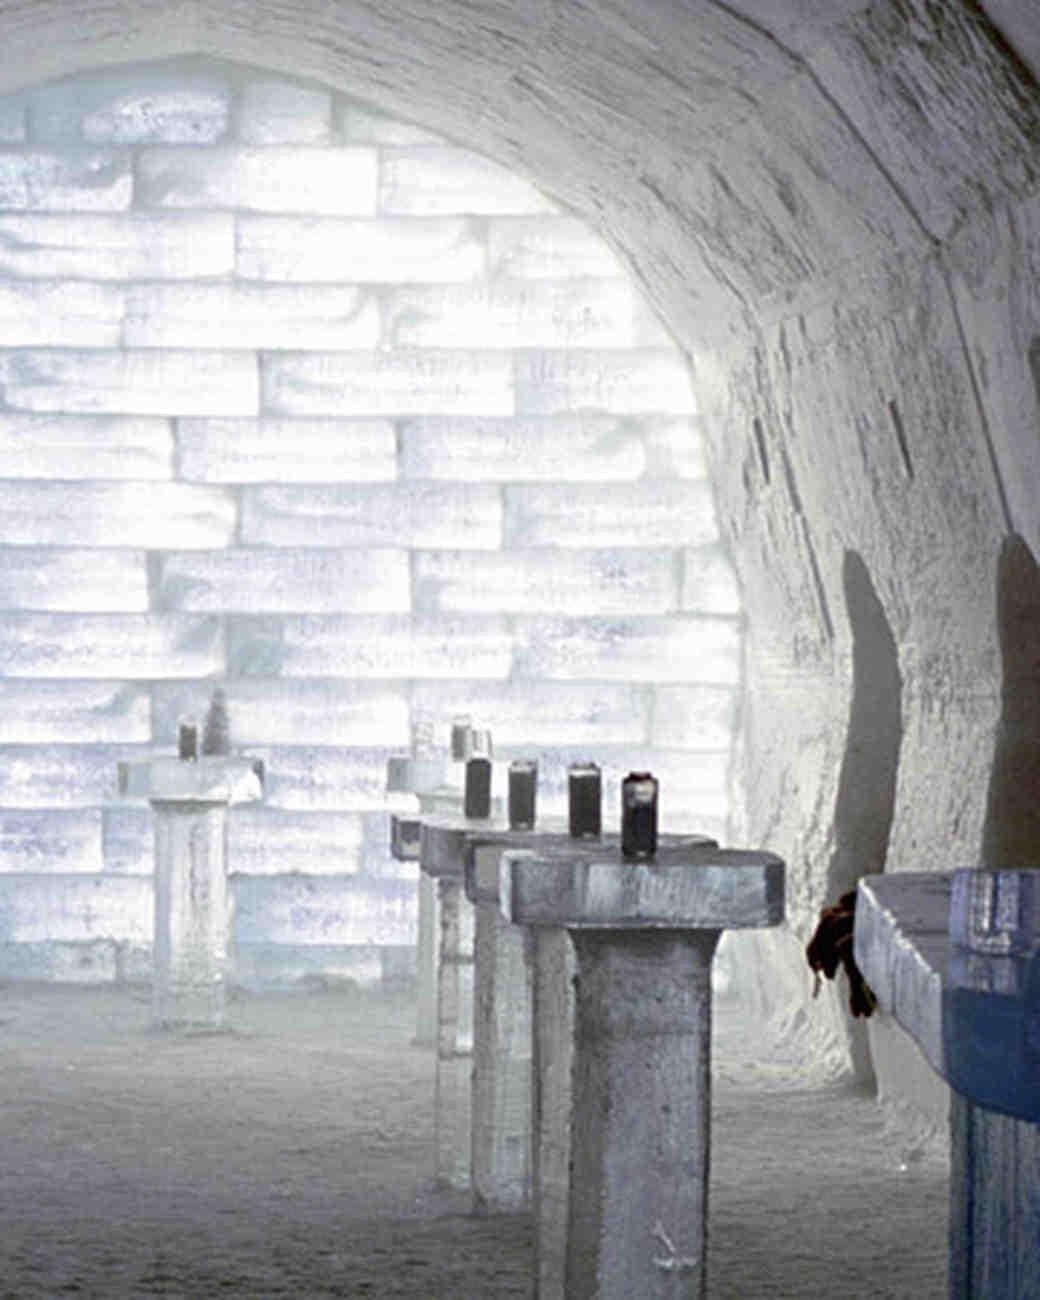 ft0122011_win04_ice_palace.jpg